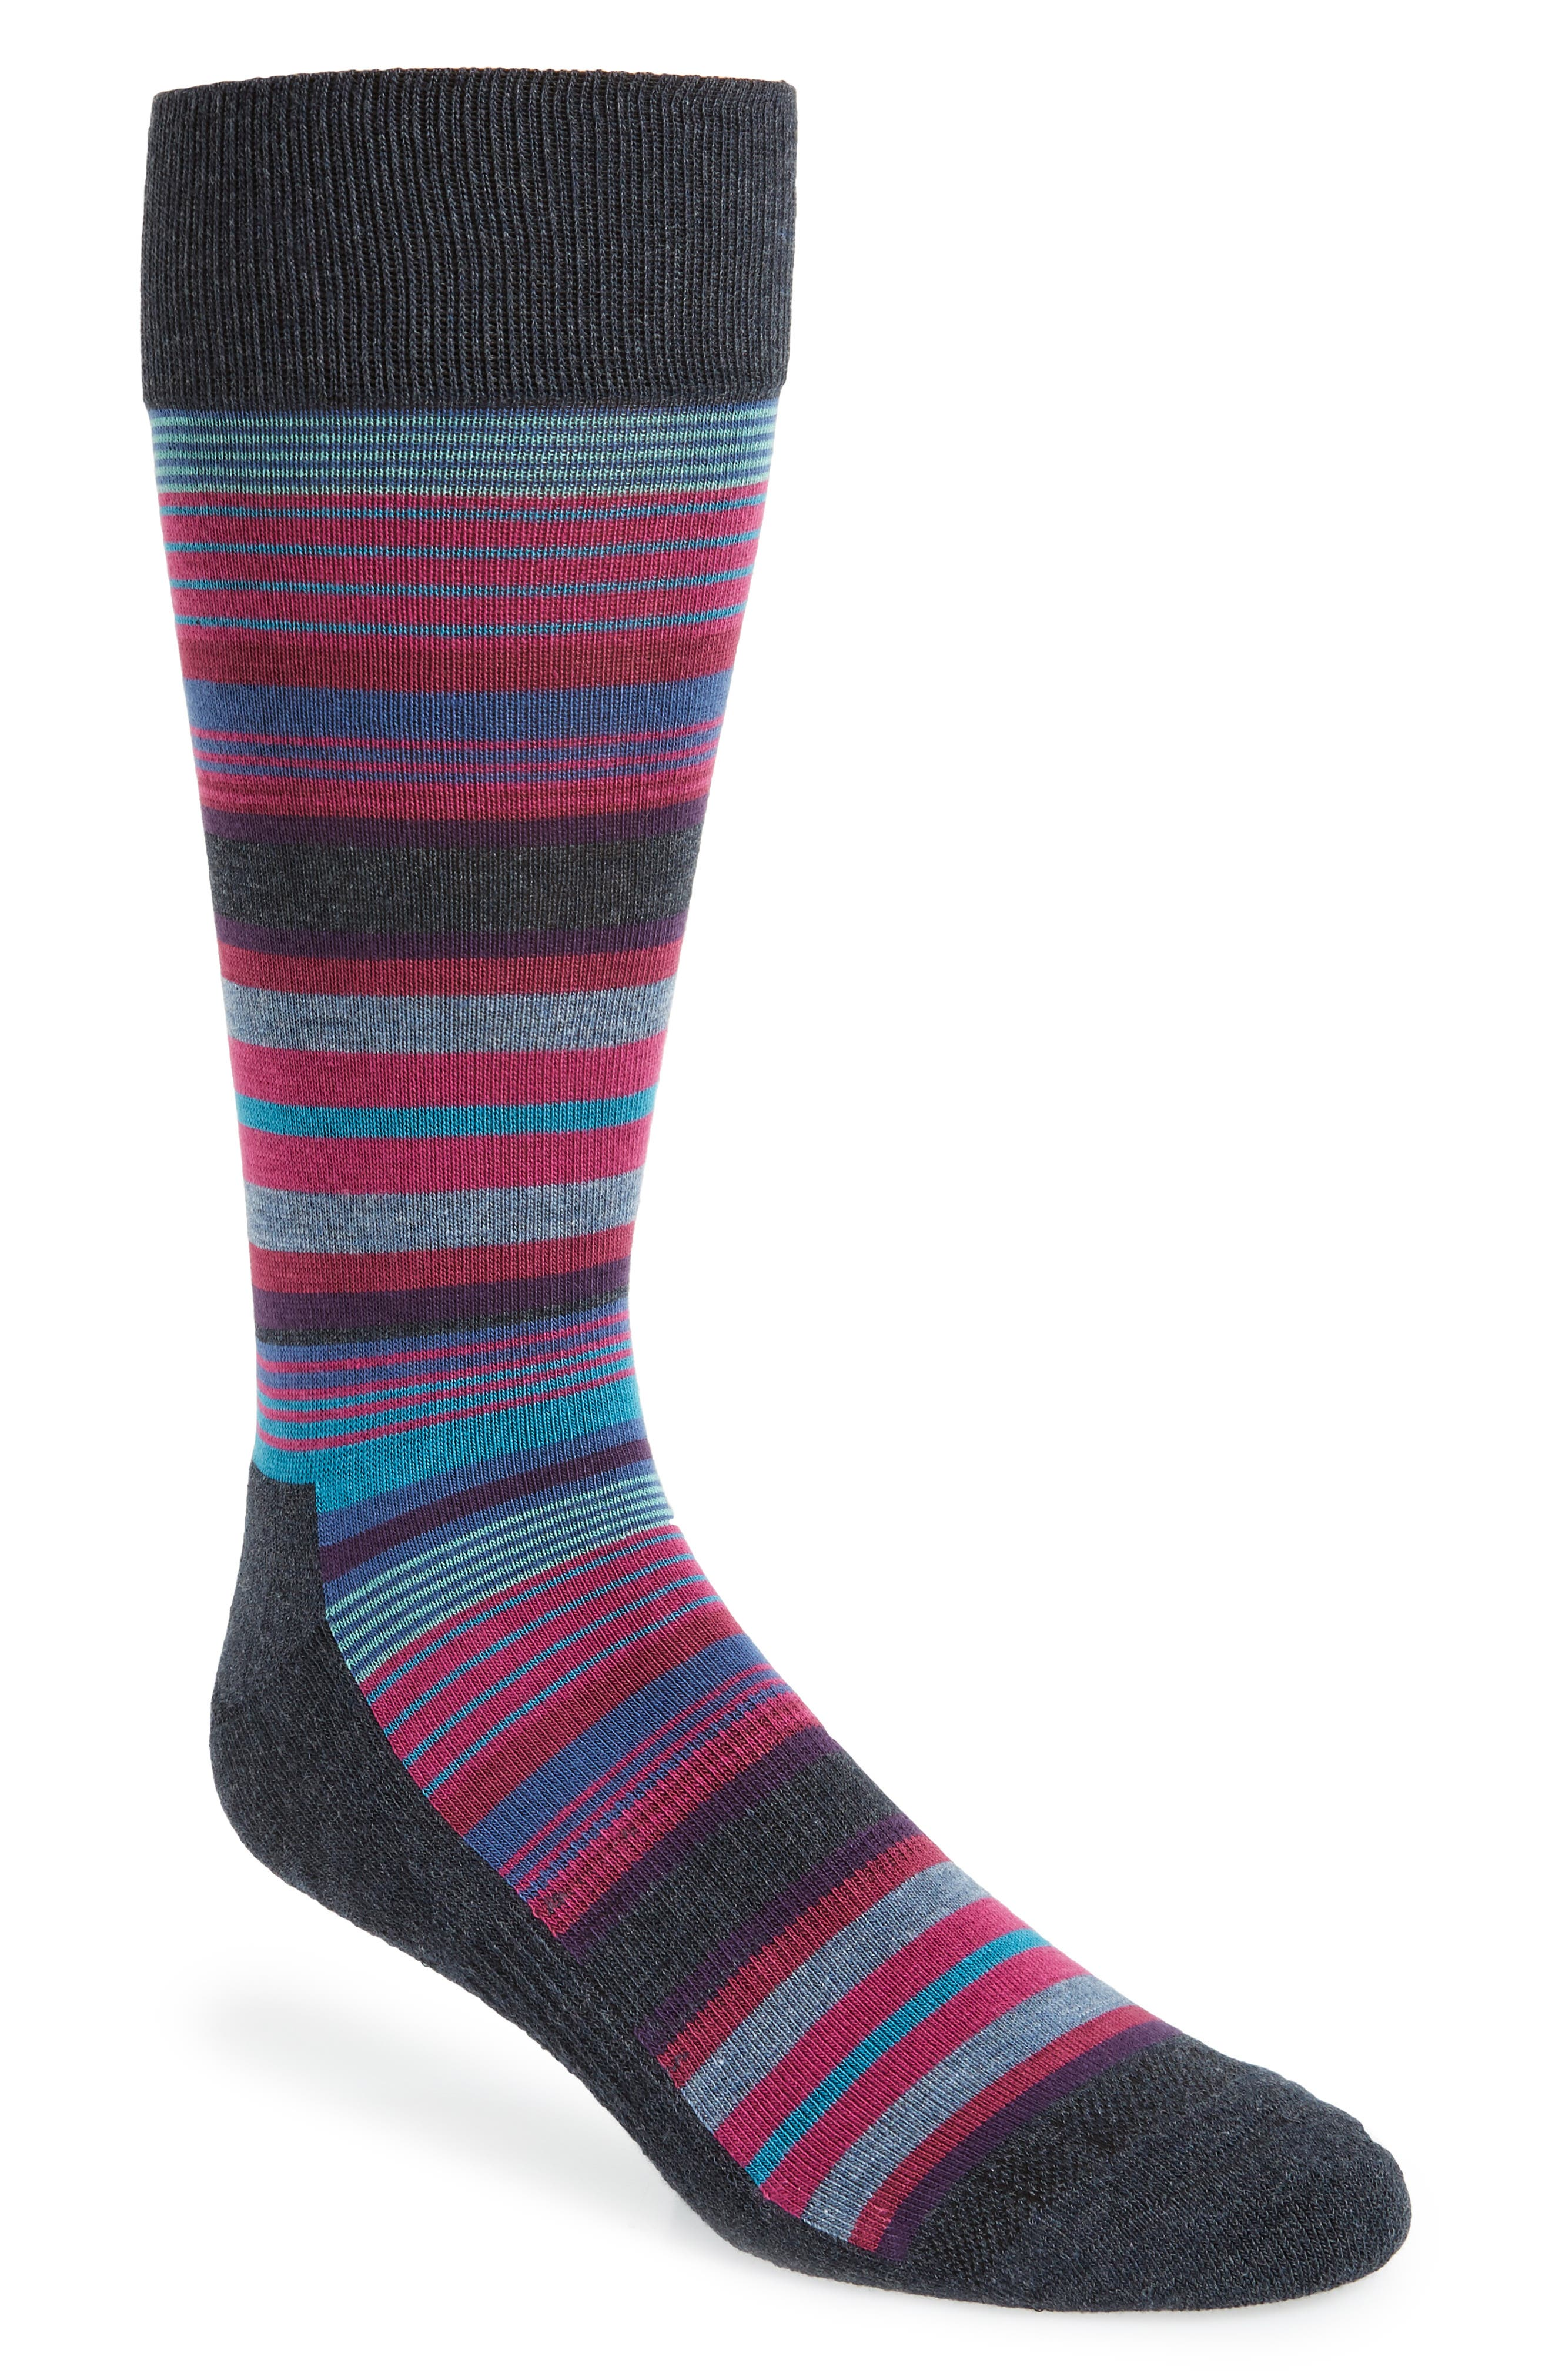 Variegated Stripes Socks,                         Main,                         color, 410